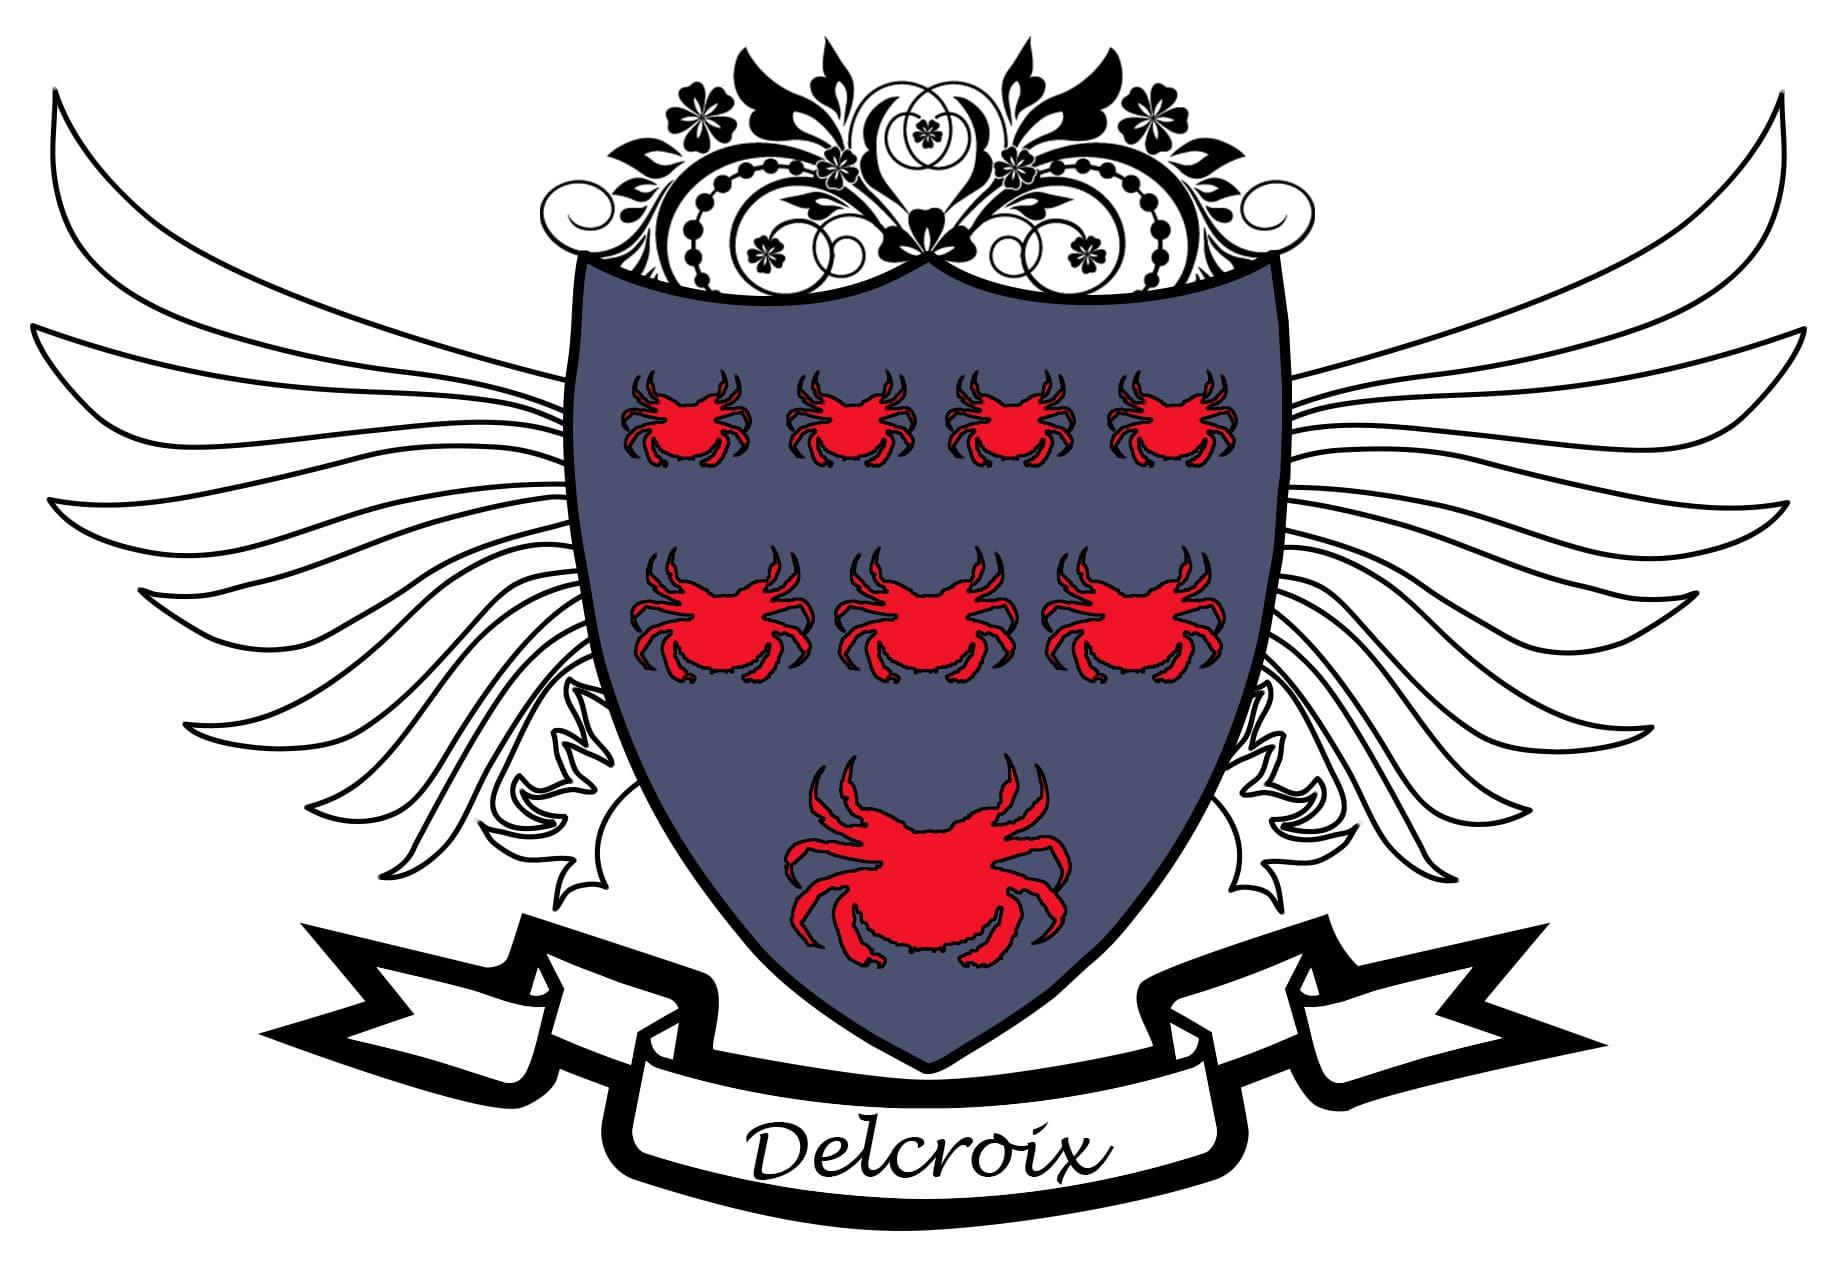 Delcroix.jpg